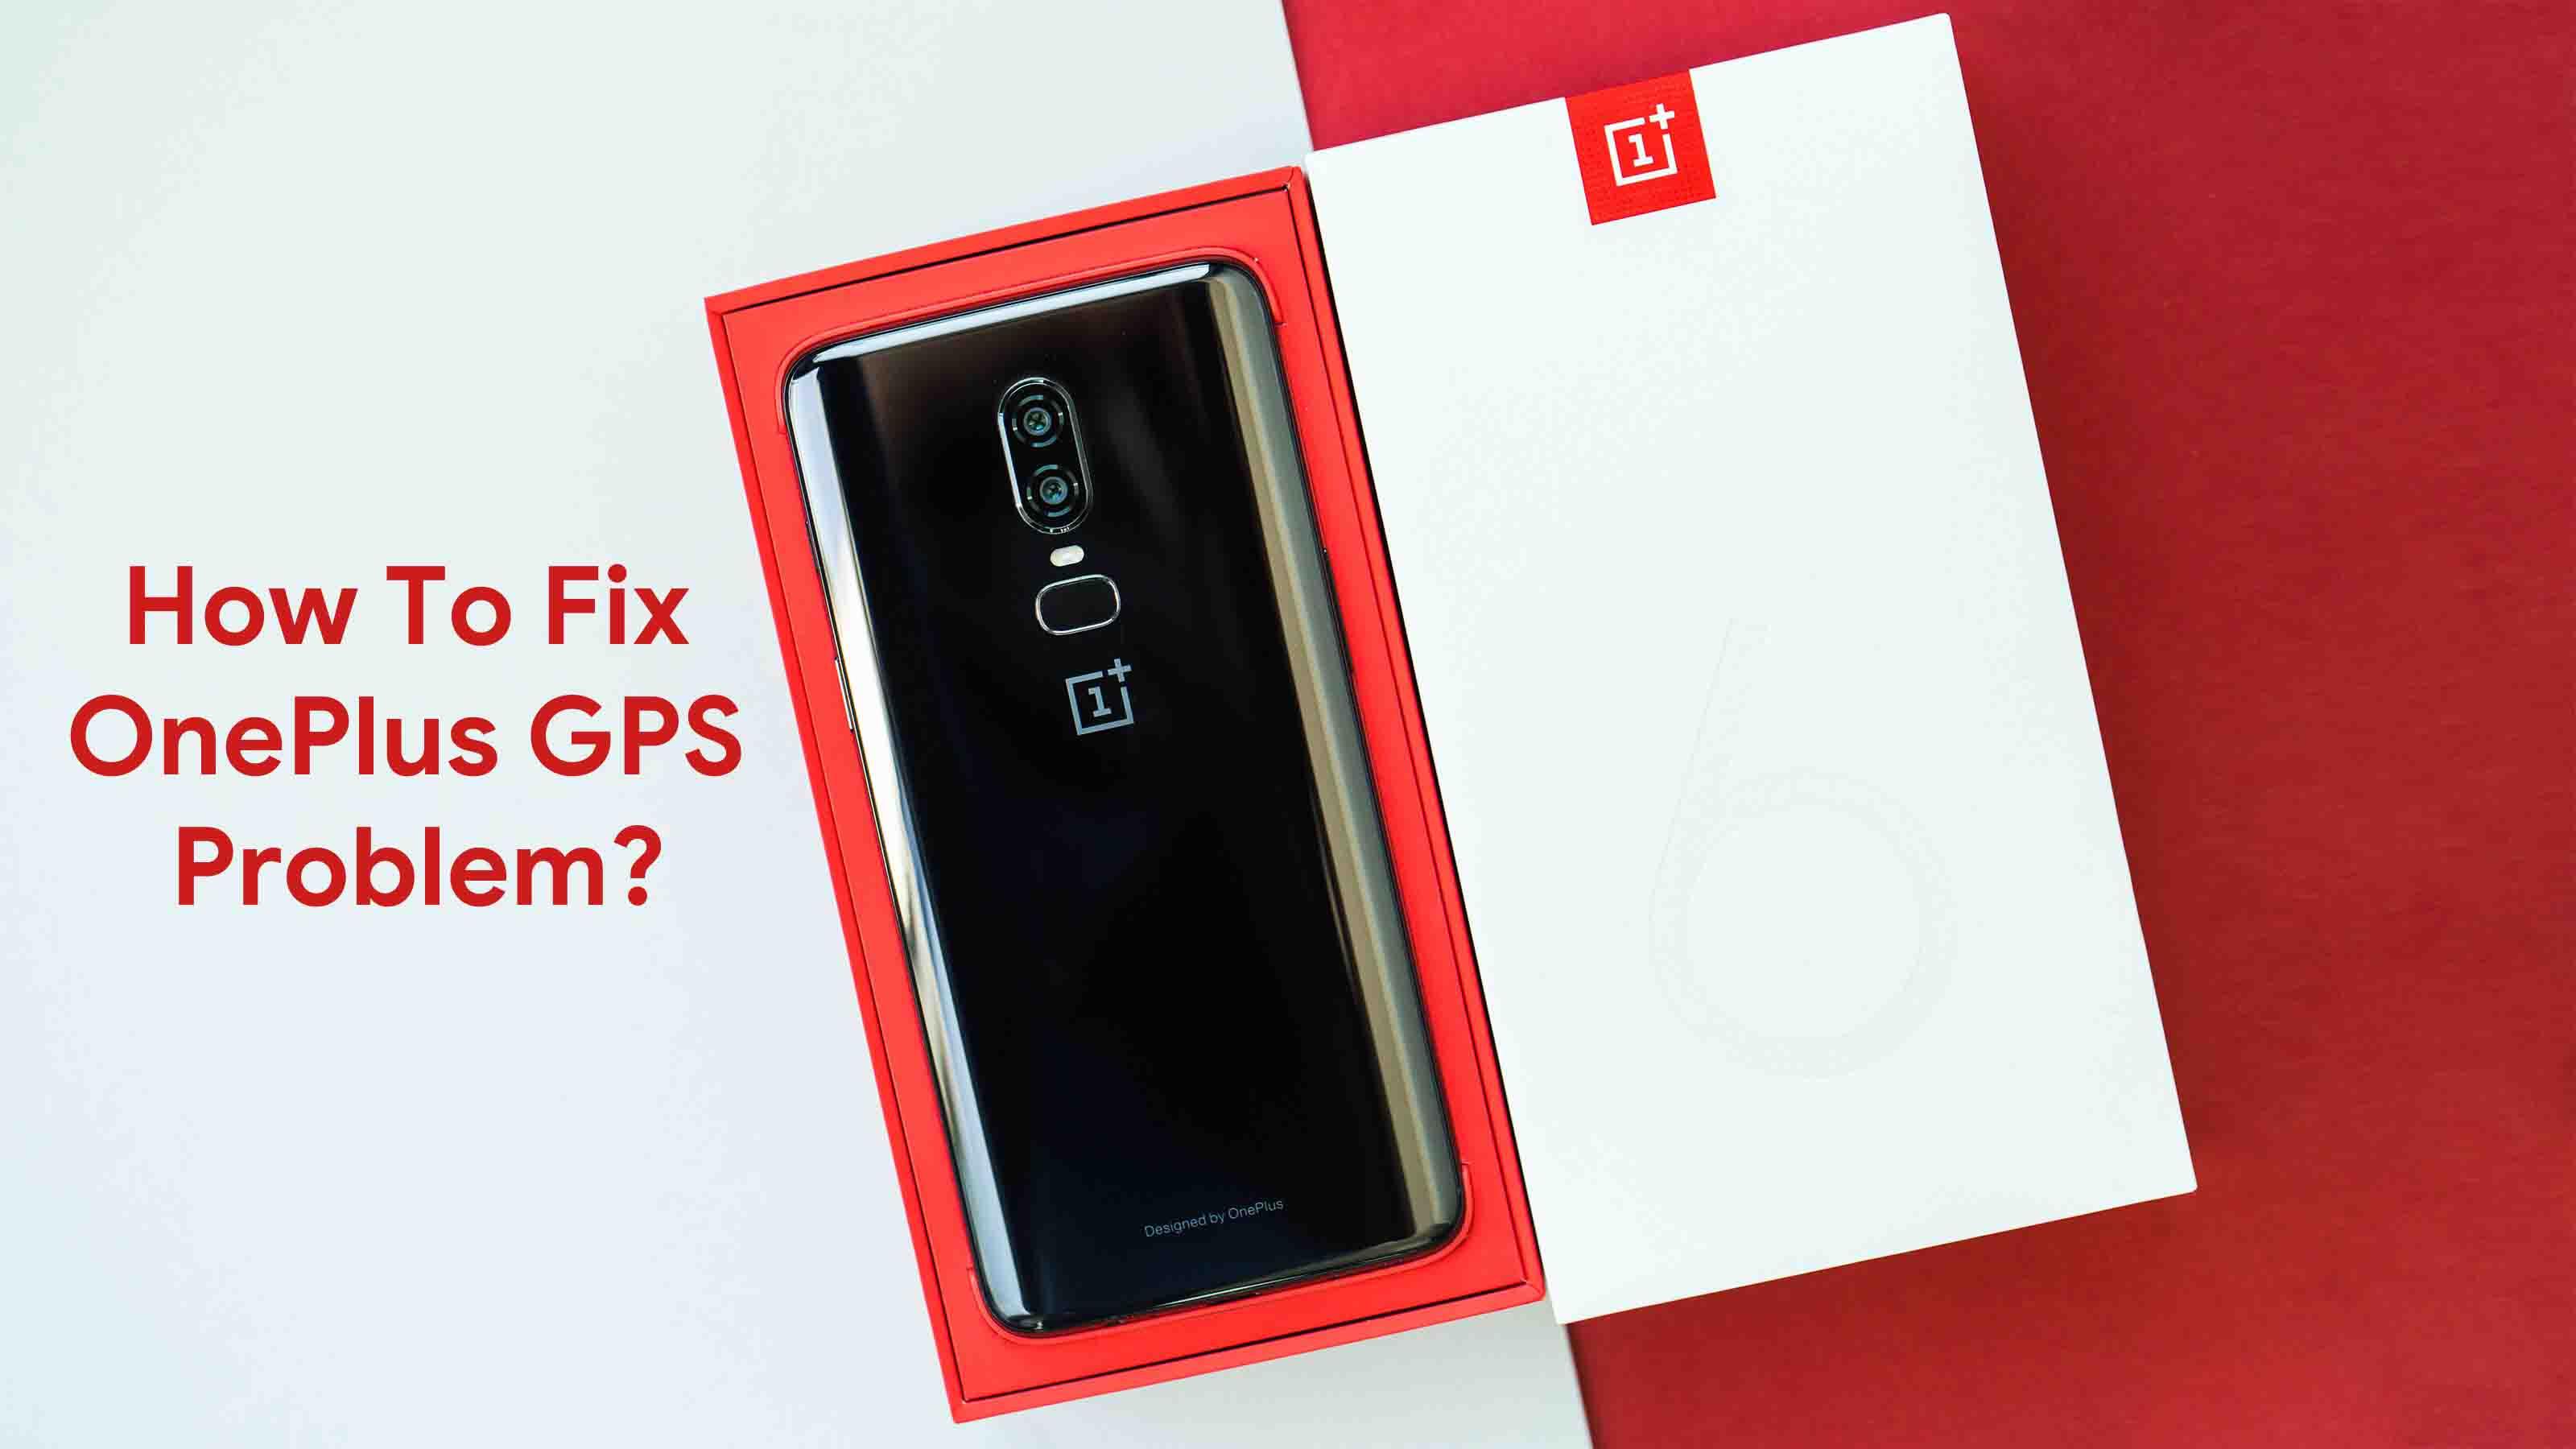 Cómo solucionar el problema de OnePlus GPS [Methods & Quick Troubleshoot]